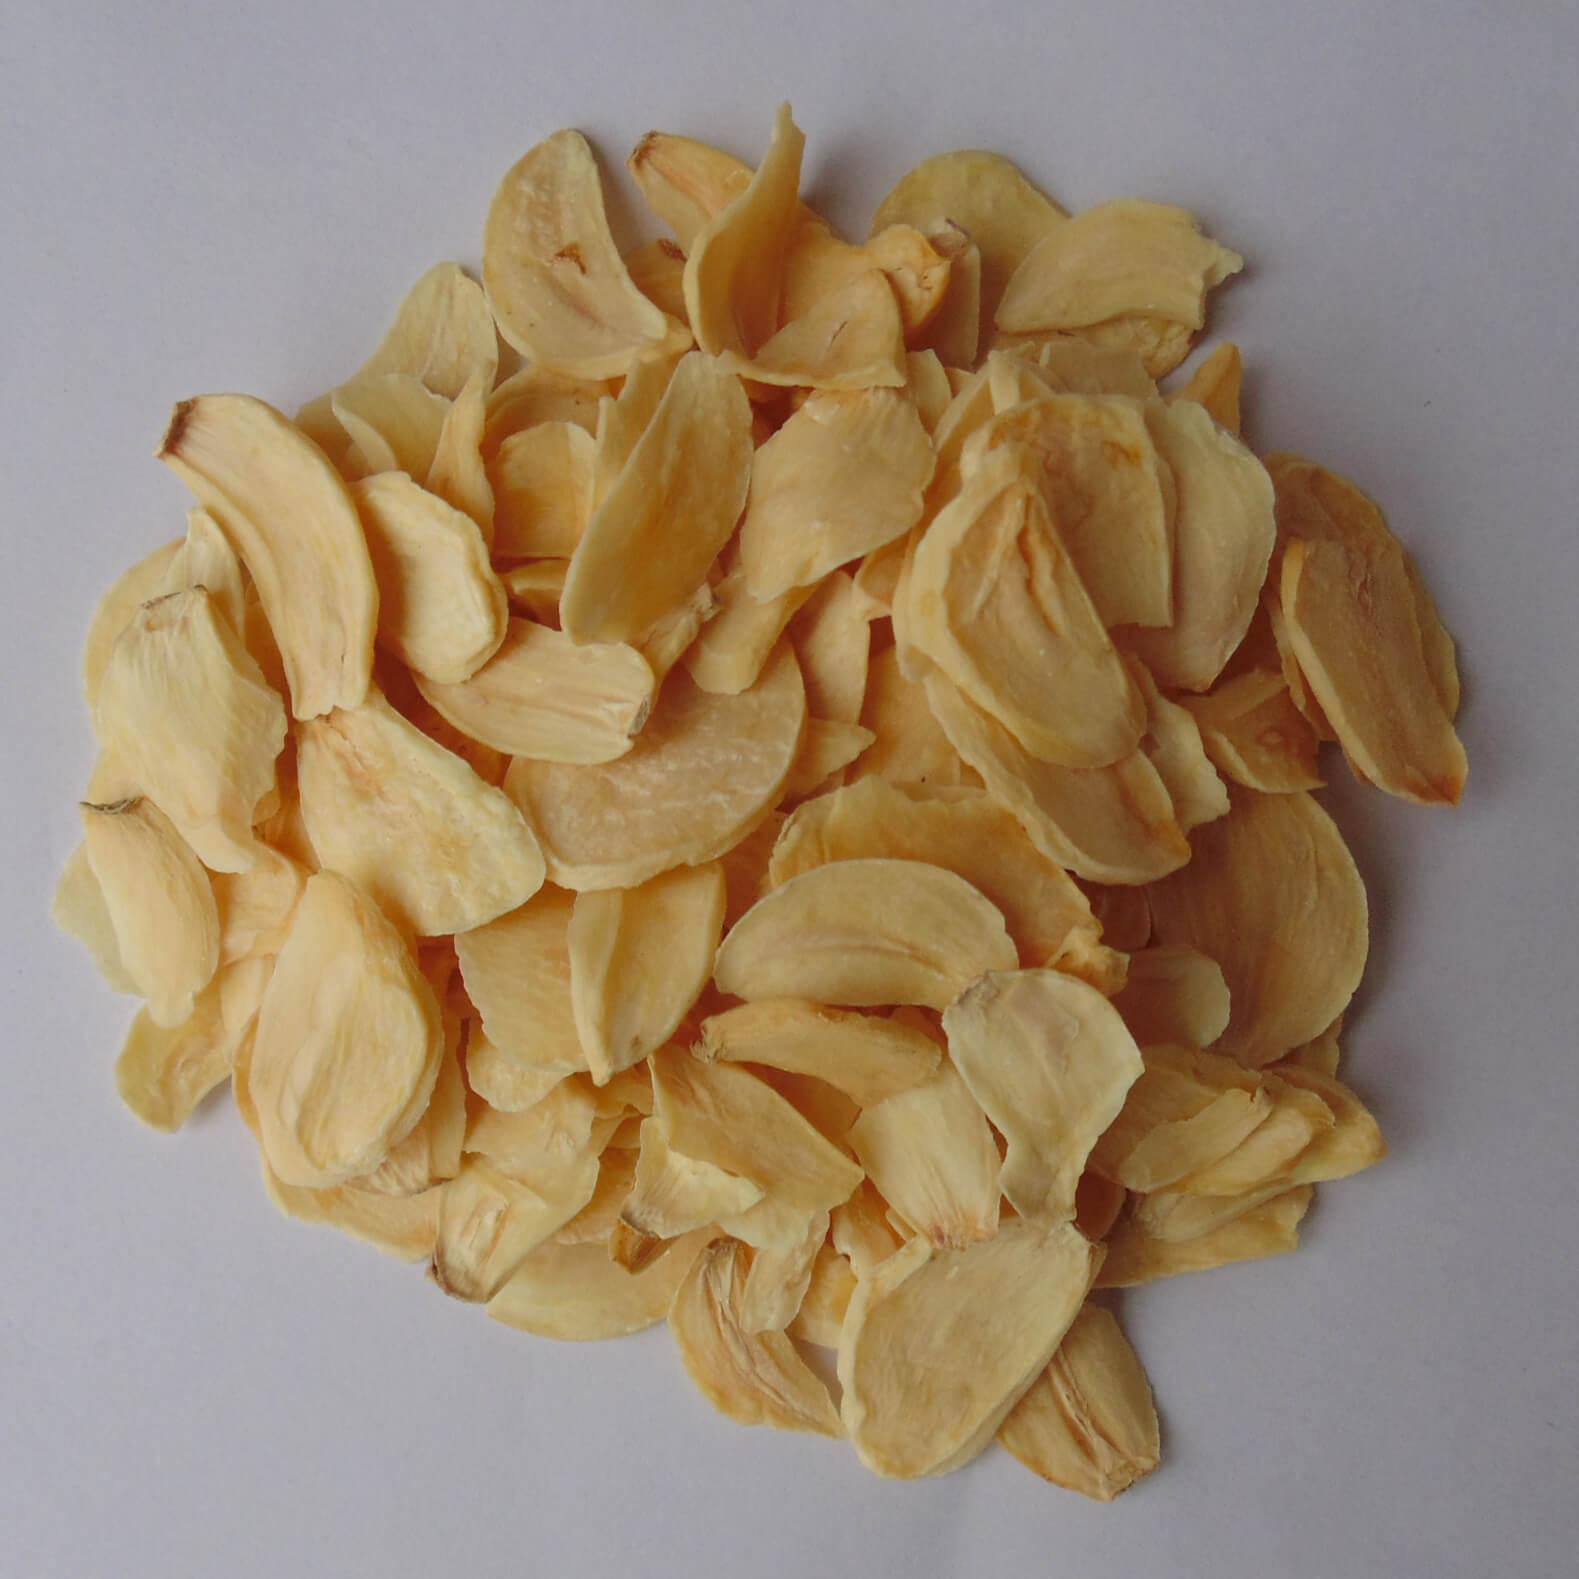 hybrid garlic flakes